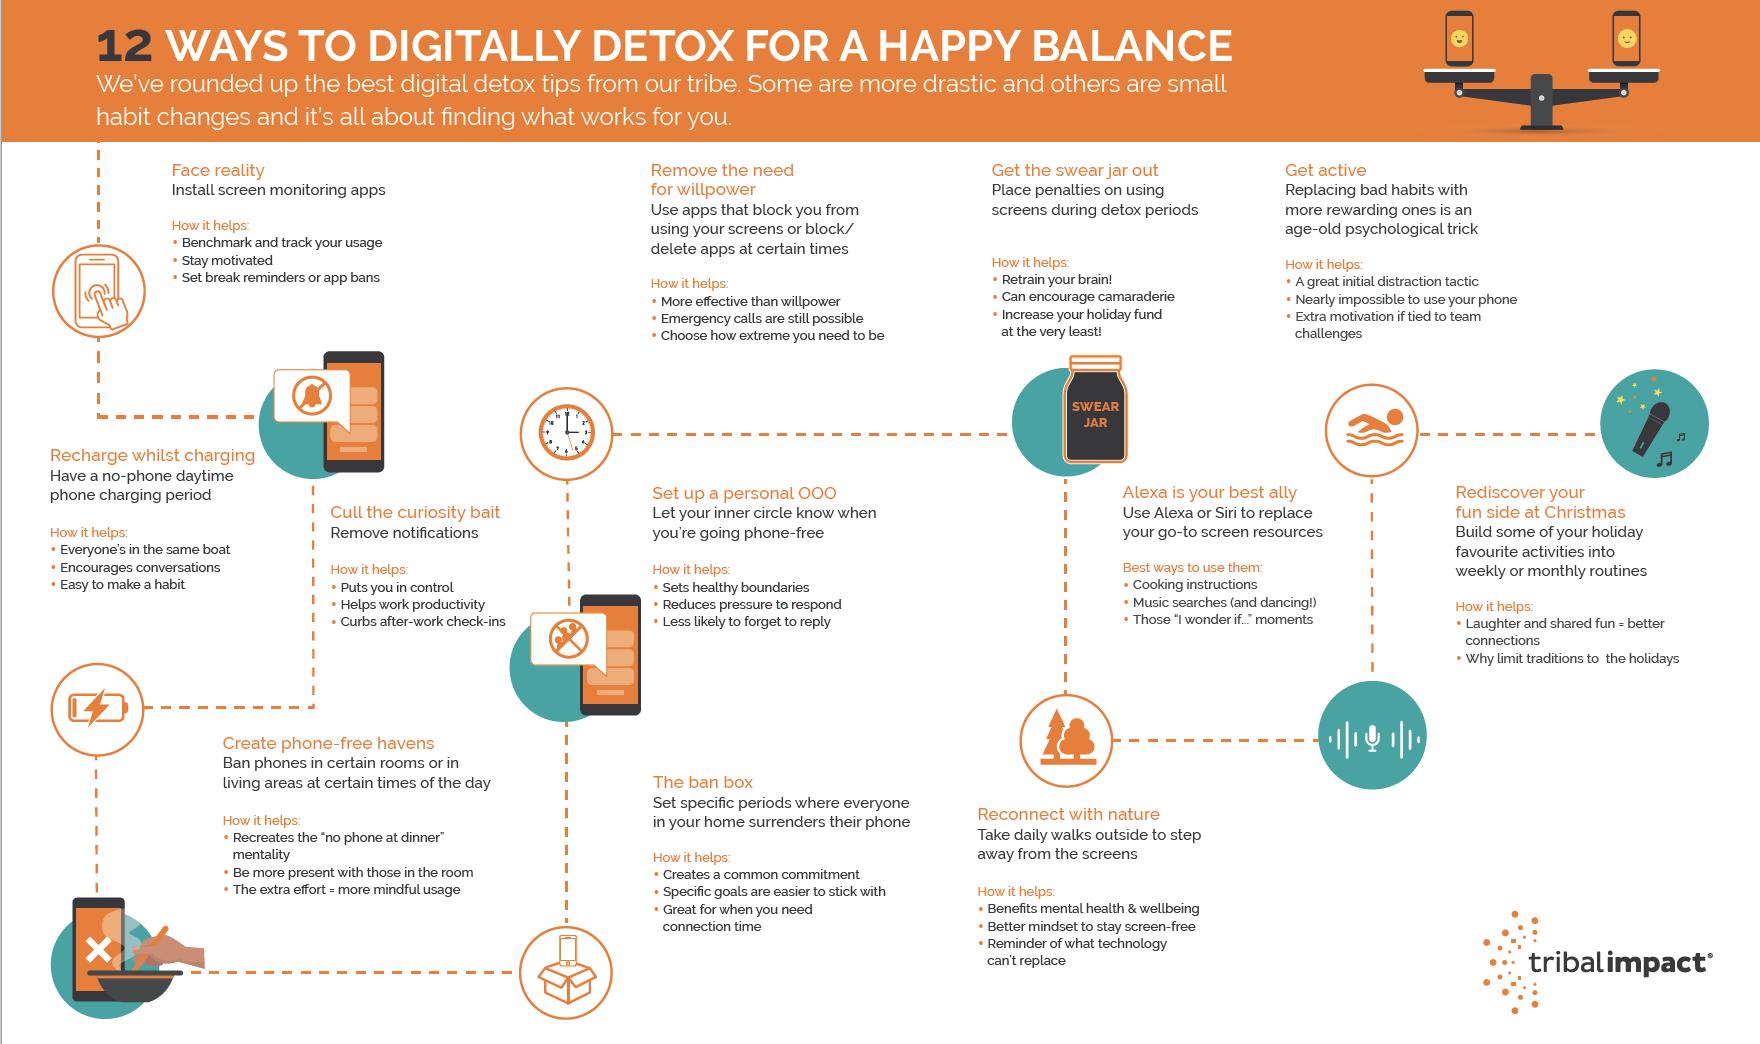 Digital Detox Infographic Image